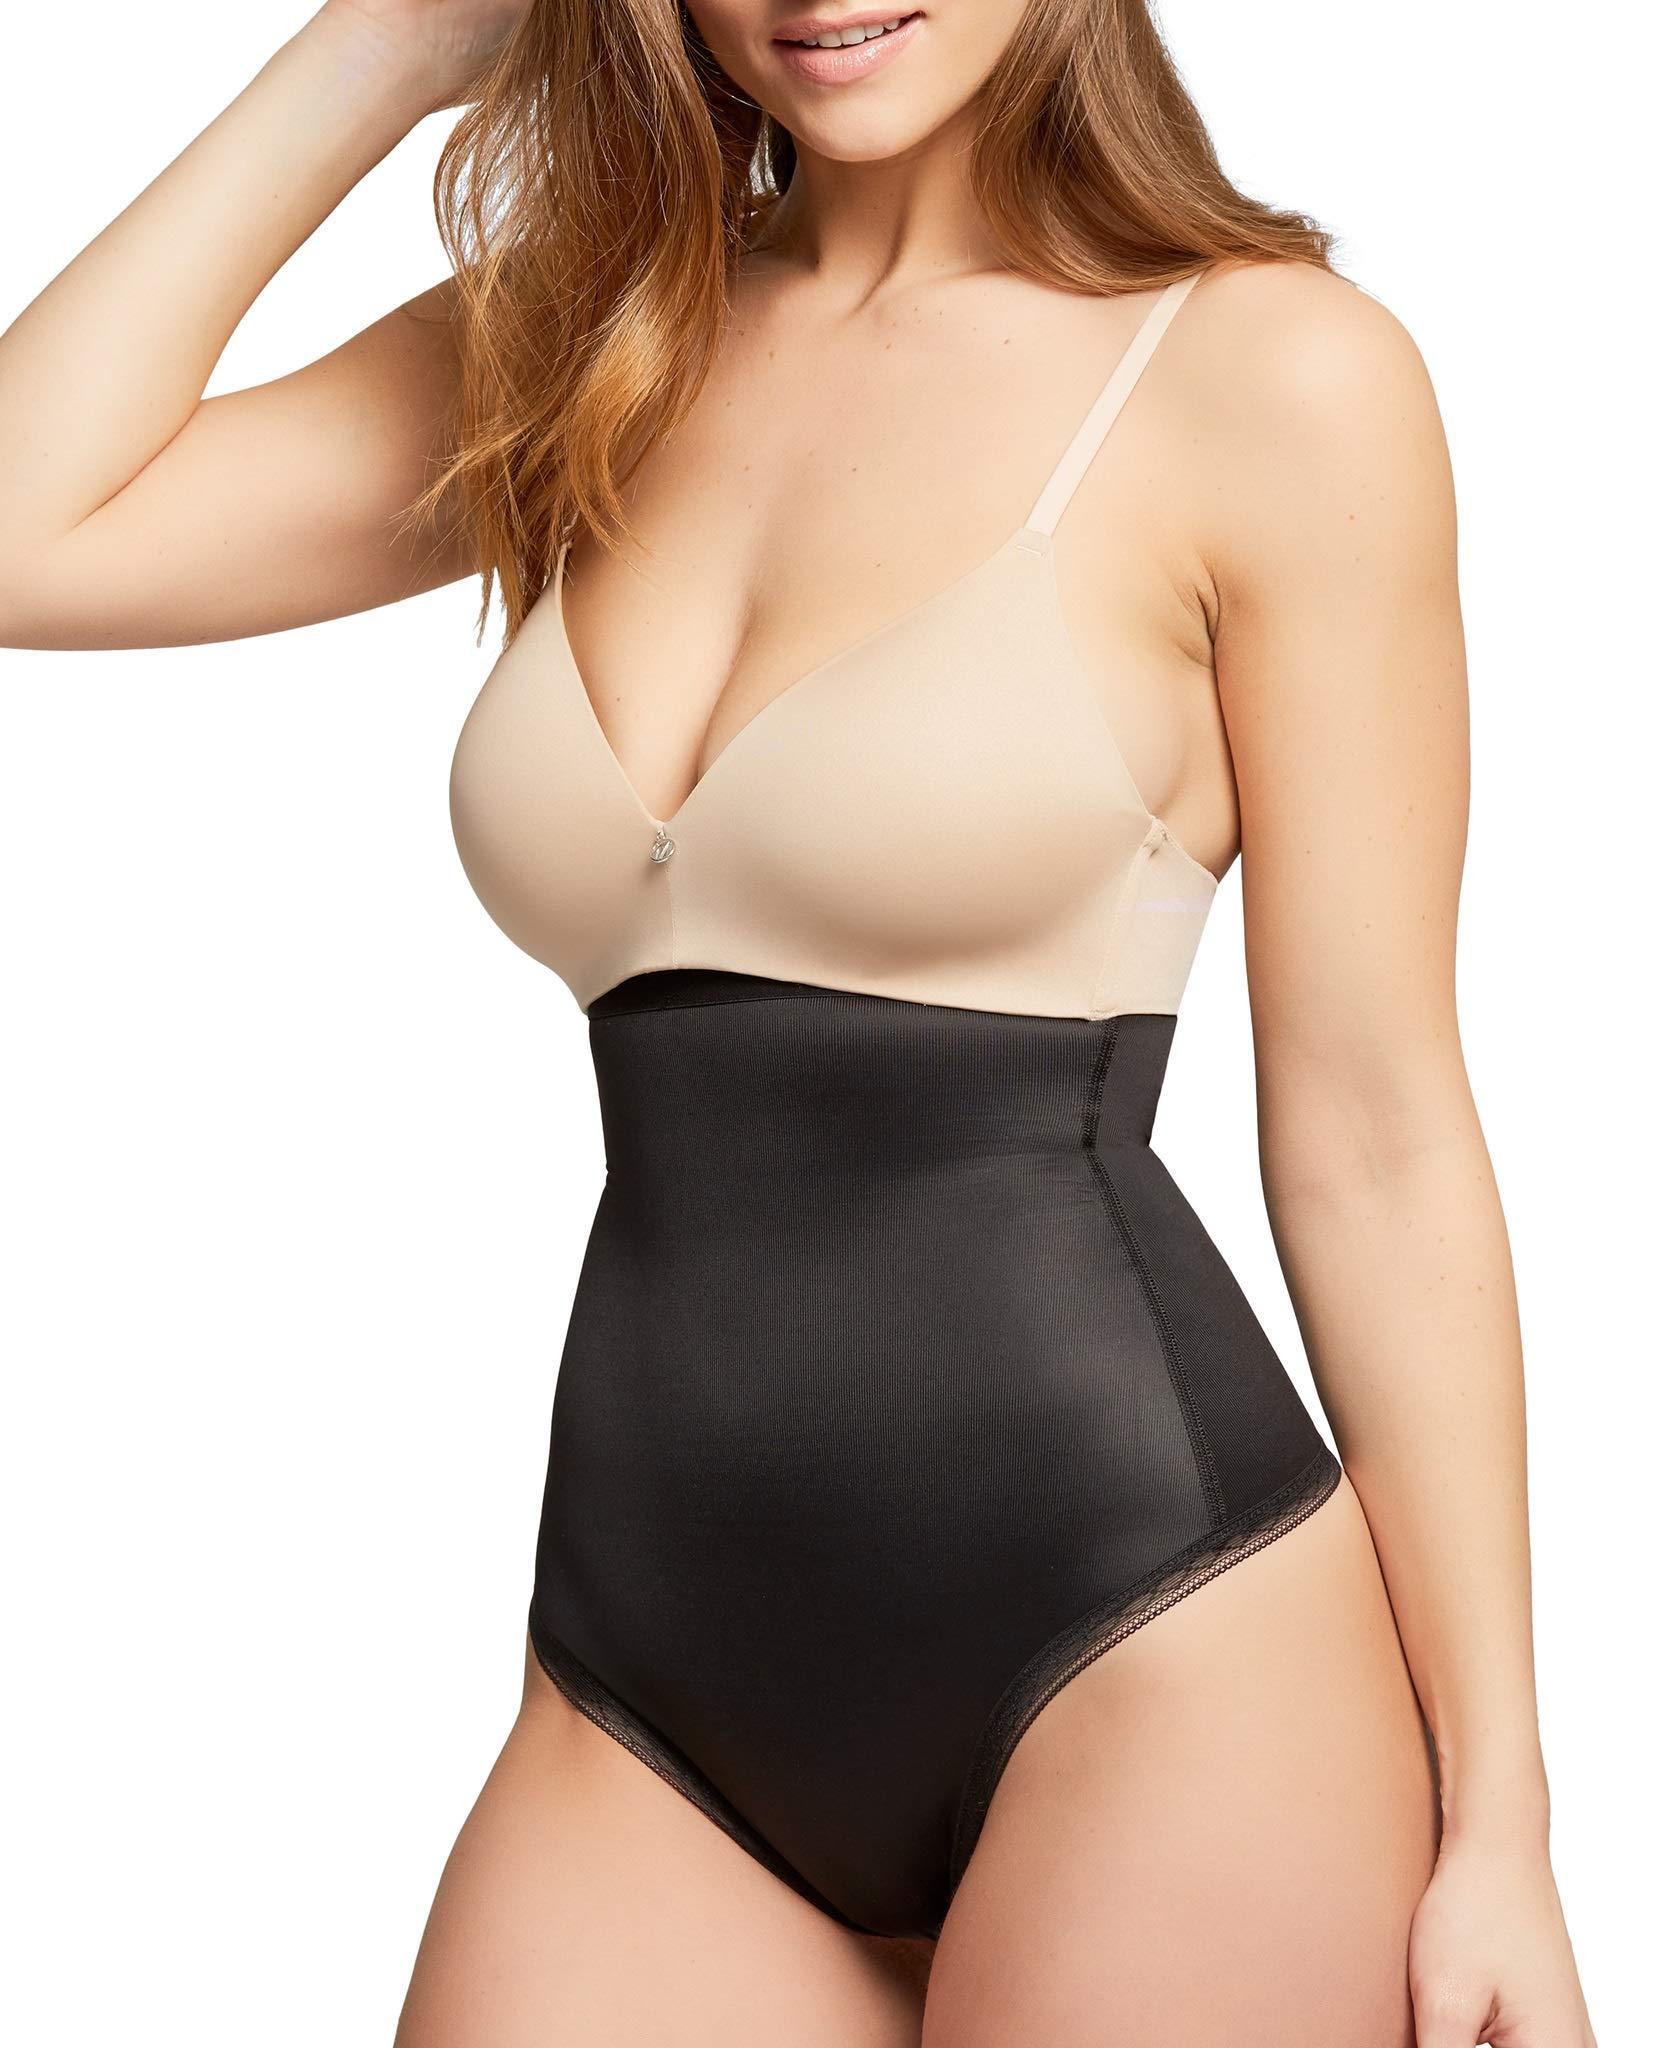 Montelle Women's Plus Size Thong Shapewear Firm Tummy Control High Waist Body Shaper Thong